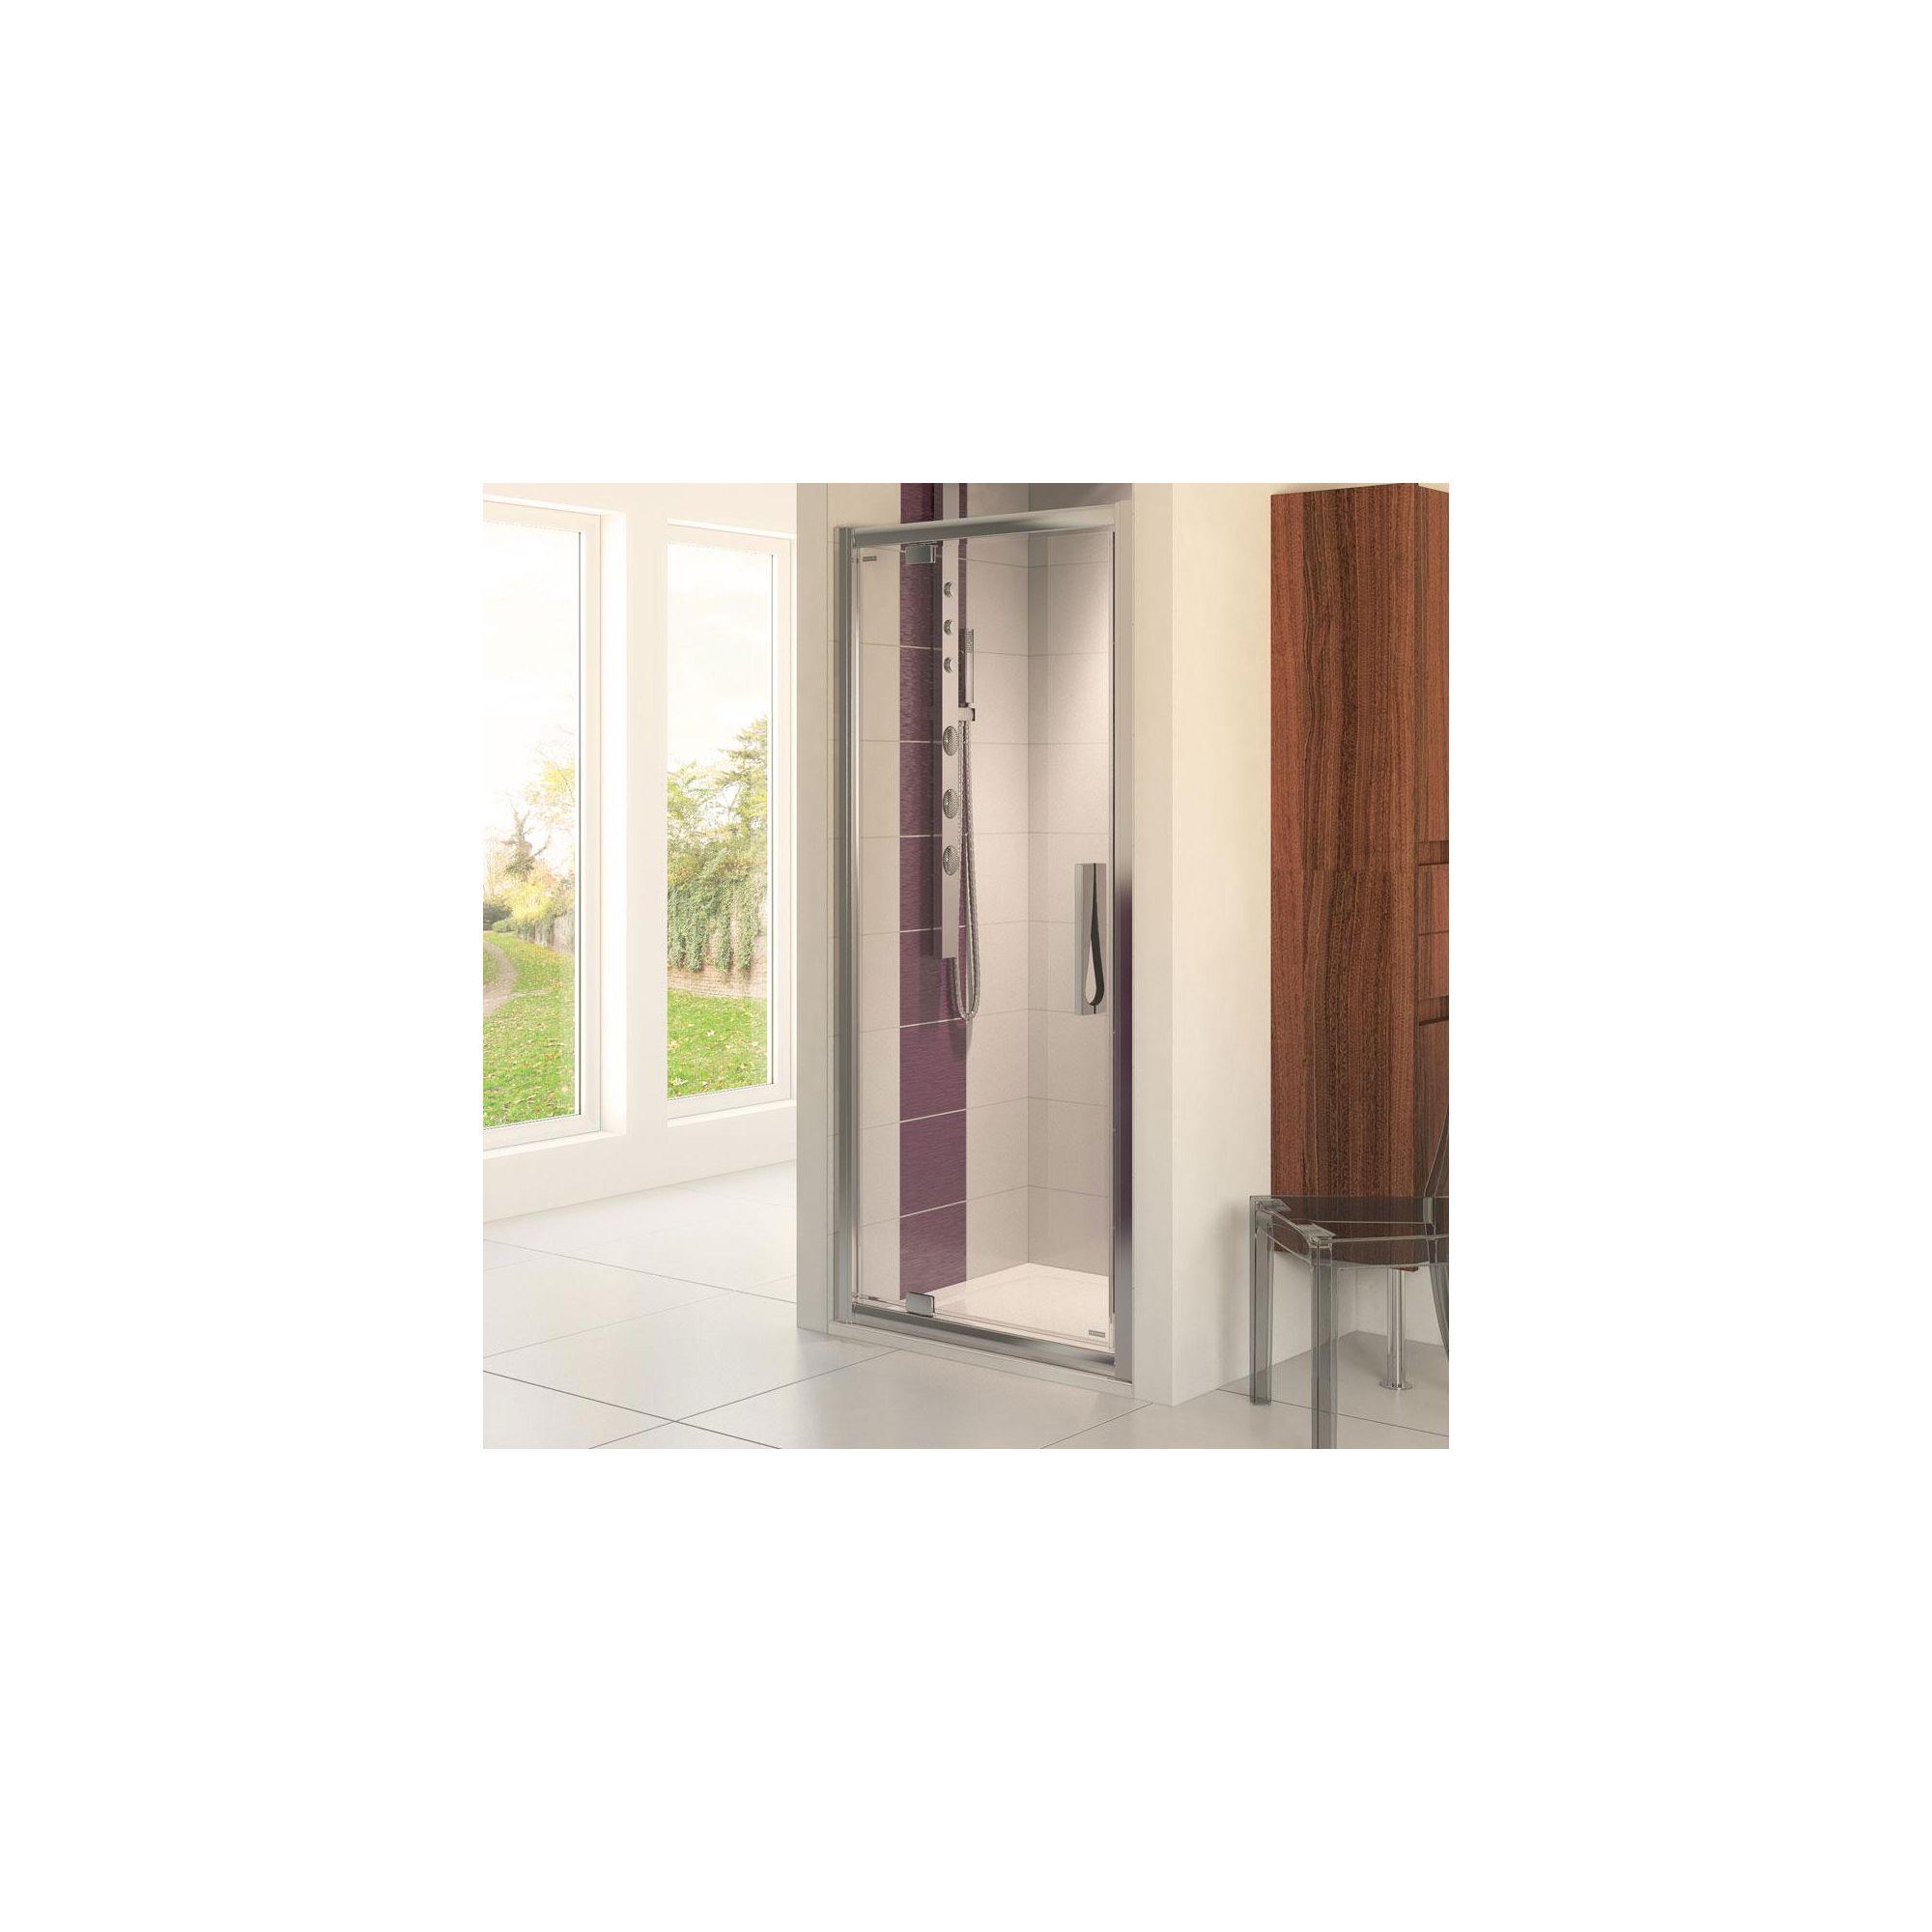 Aqualux AQUA8 Glide Pivot Shower Door, 800mm Wide, Polished Silver Frame, 8mm Glass at Tesco Direct